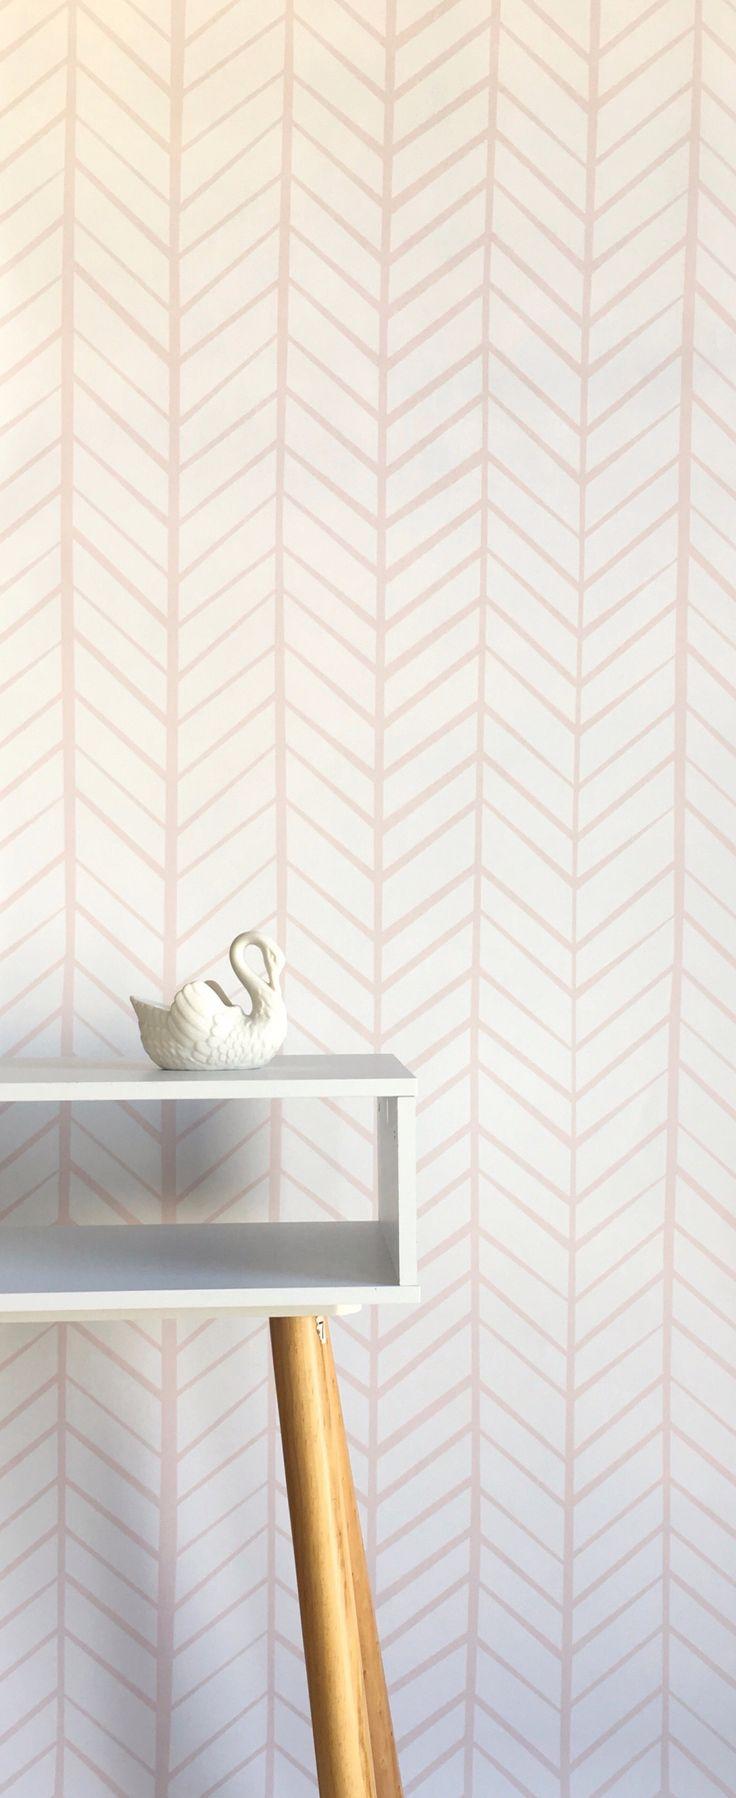 Pink and white herringbone wallpaper